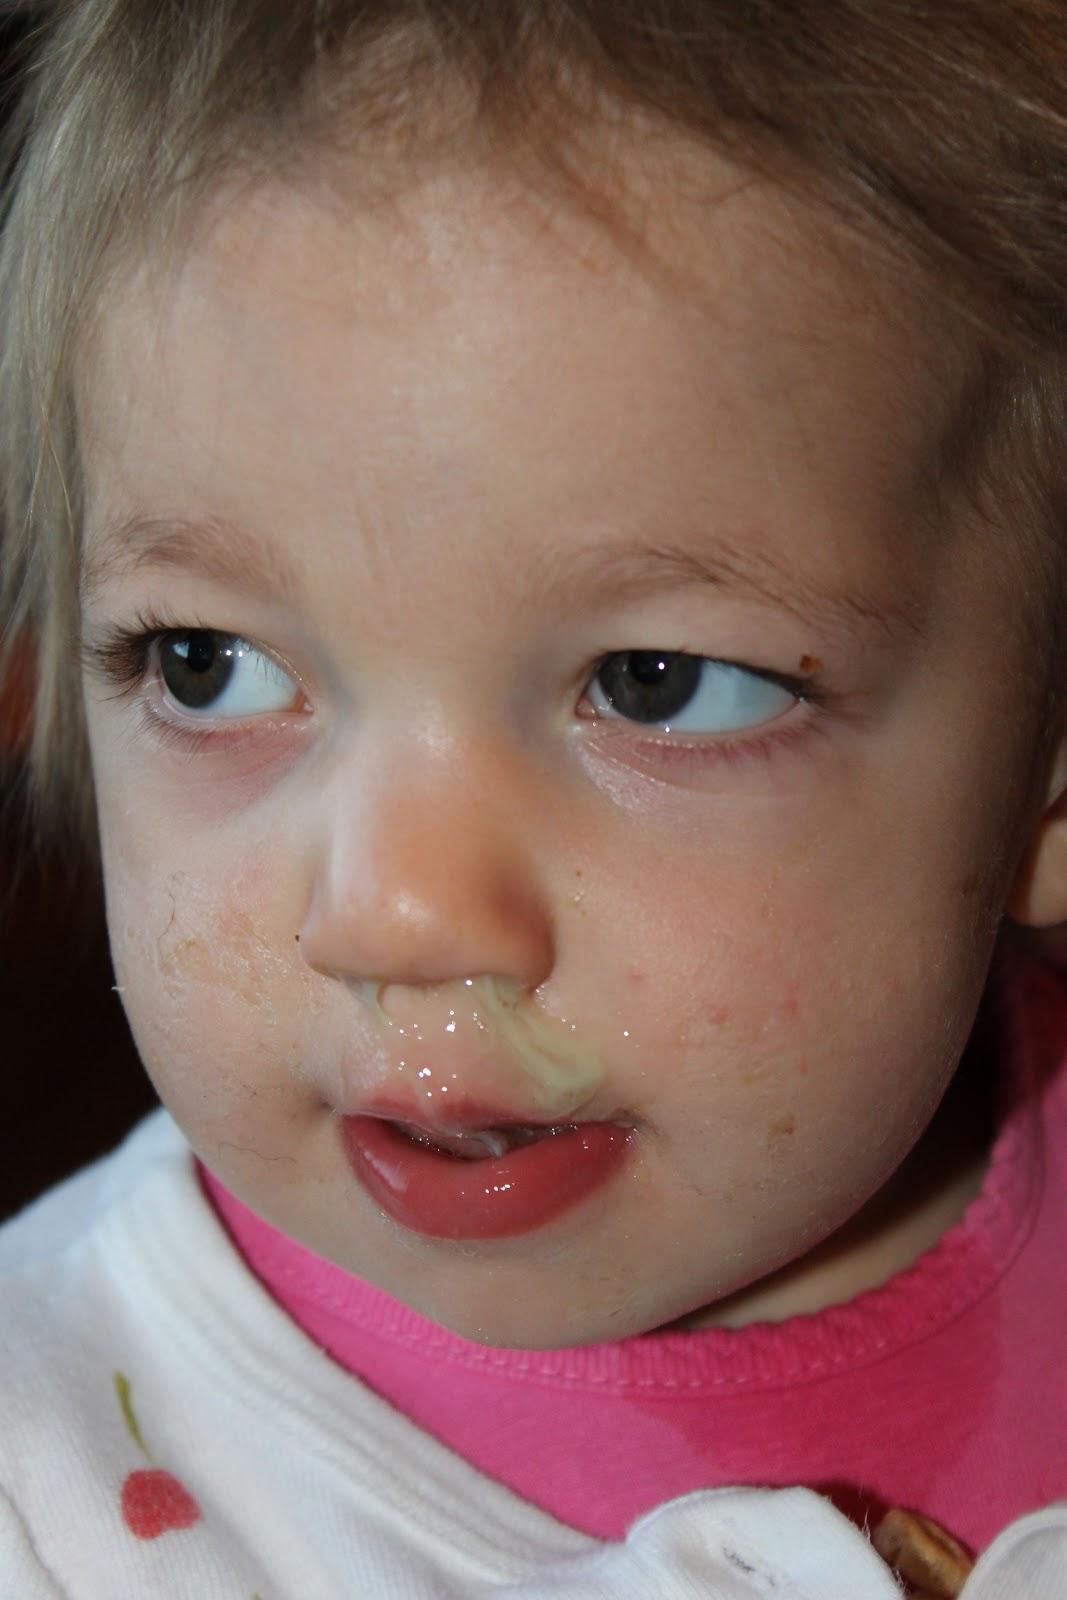 Minnesota Baby Teething Illness Amp Jet Lag Oh My